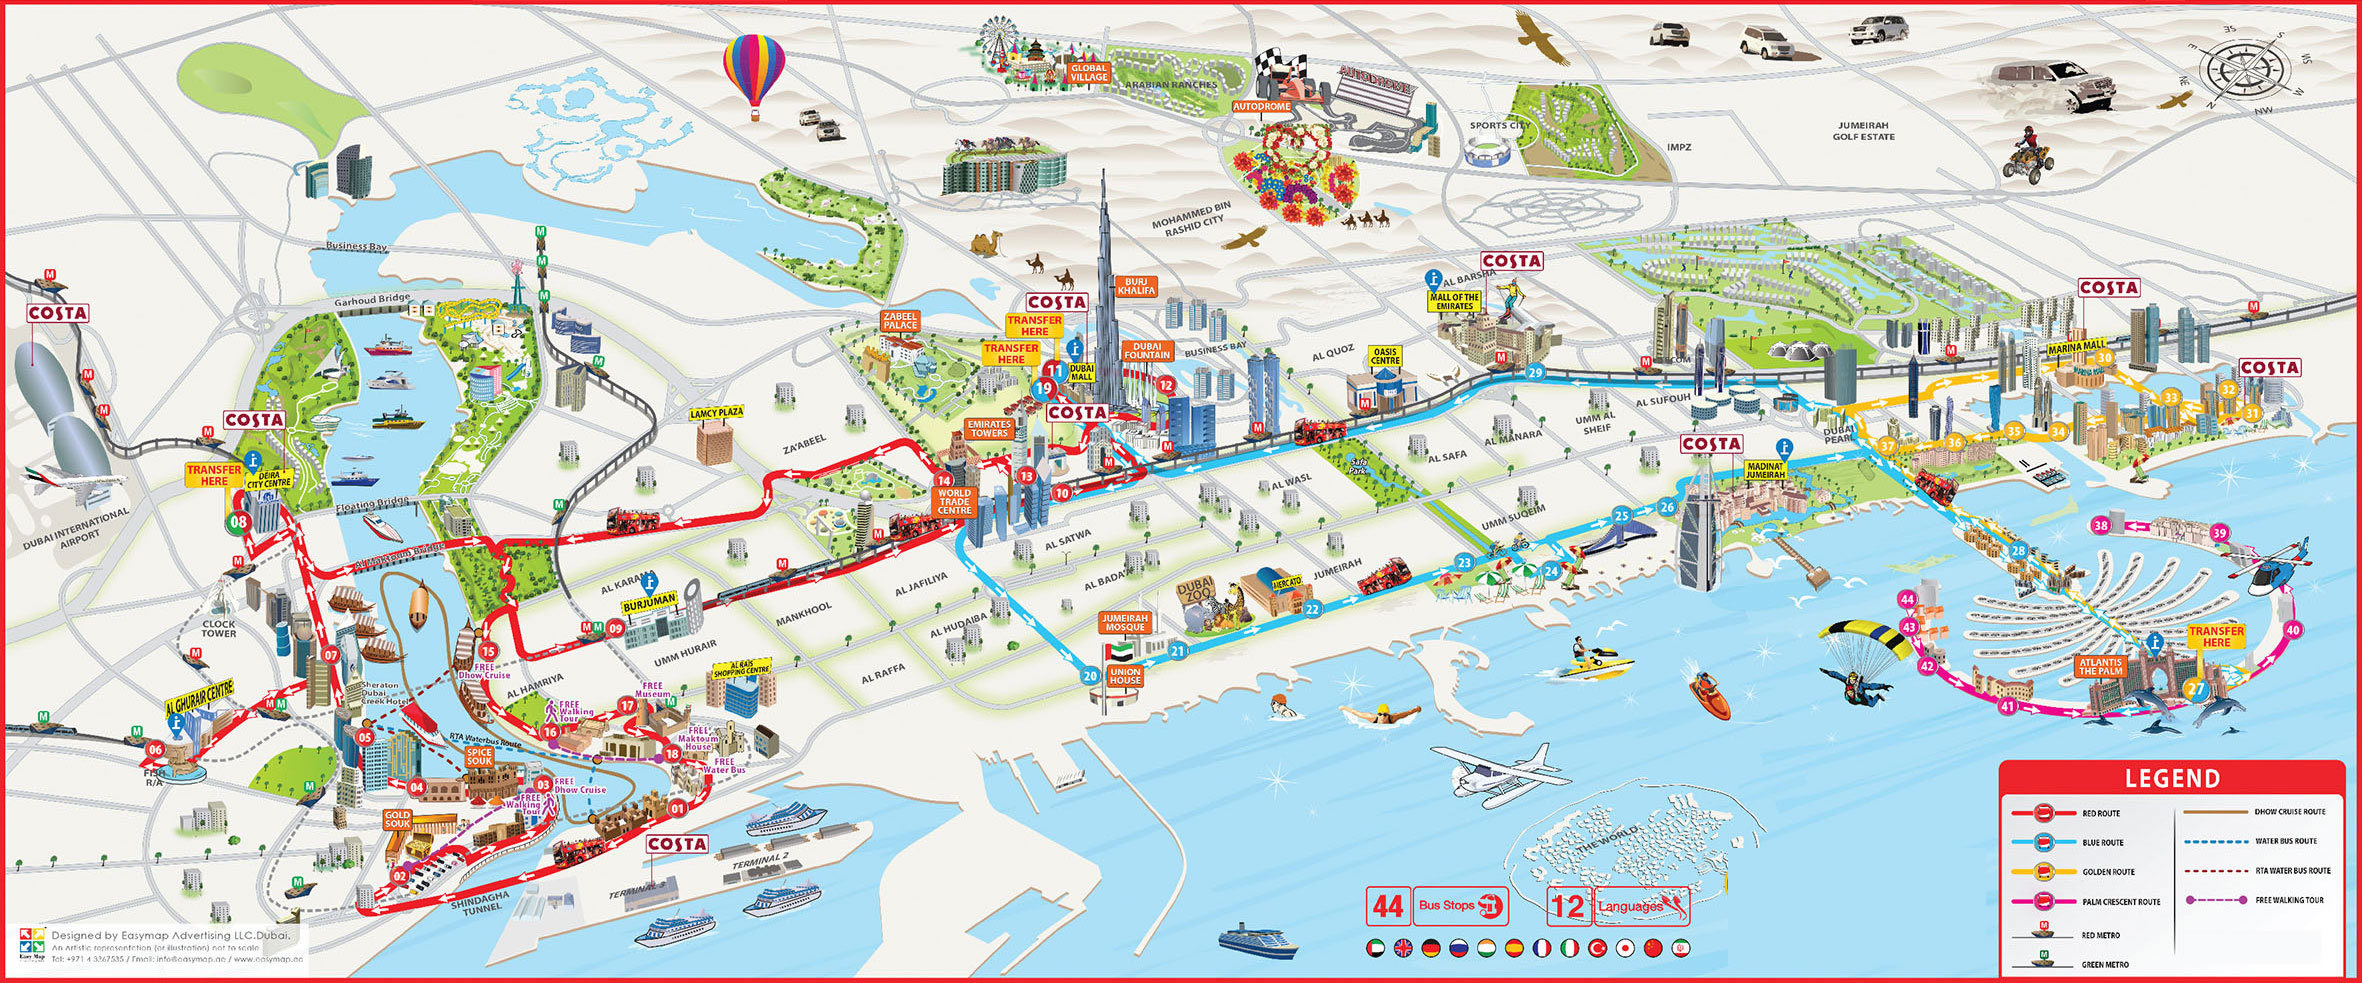 London Street Map Pdf Free Download.Dubai Tourist Attractions Map Pdf Tourism Company And Tourism